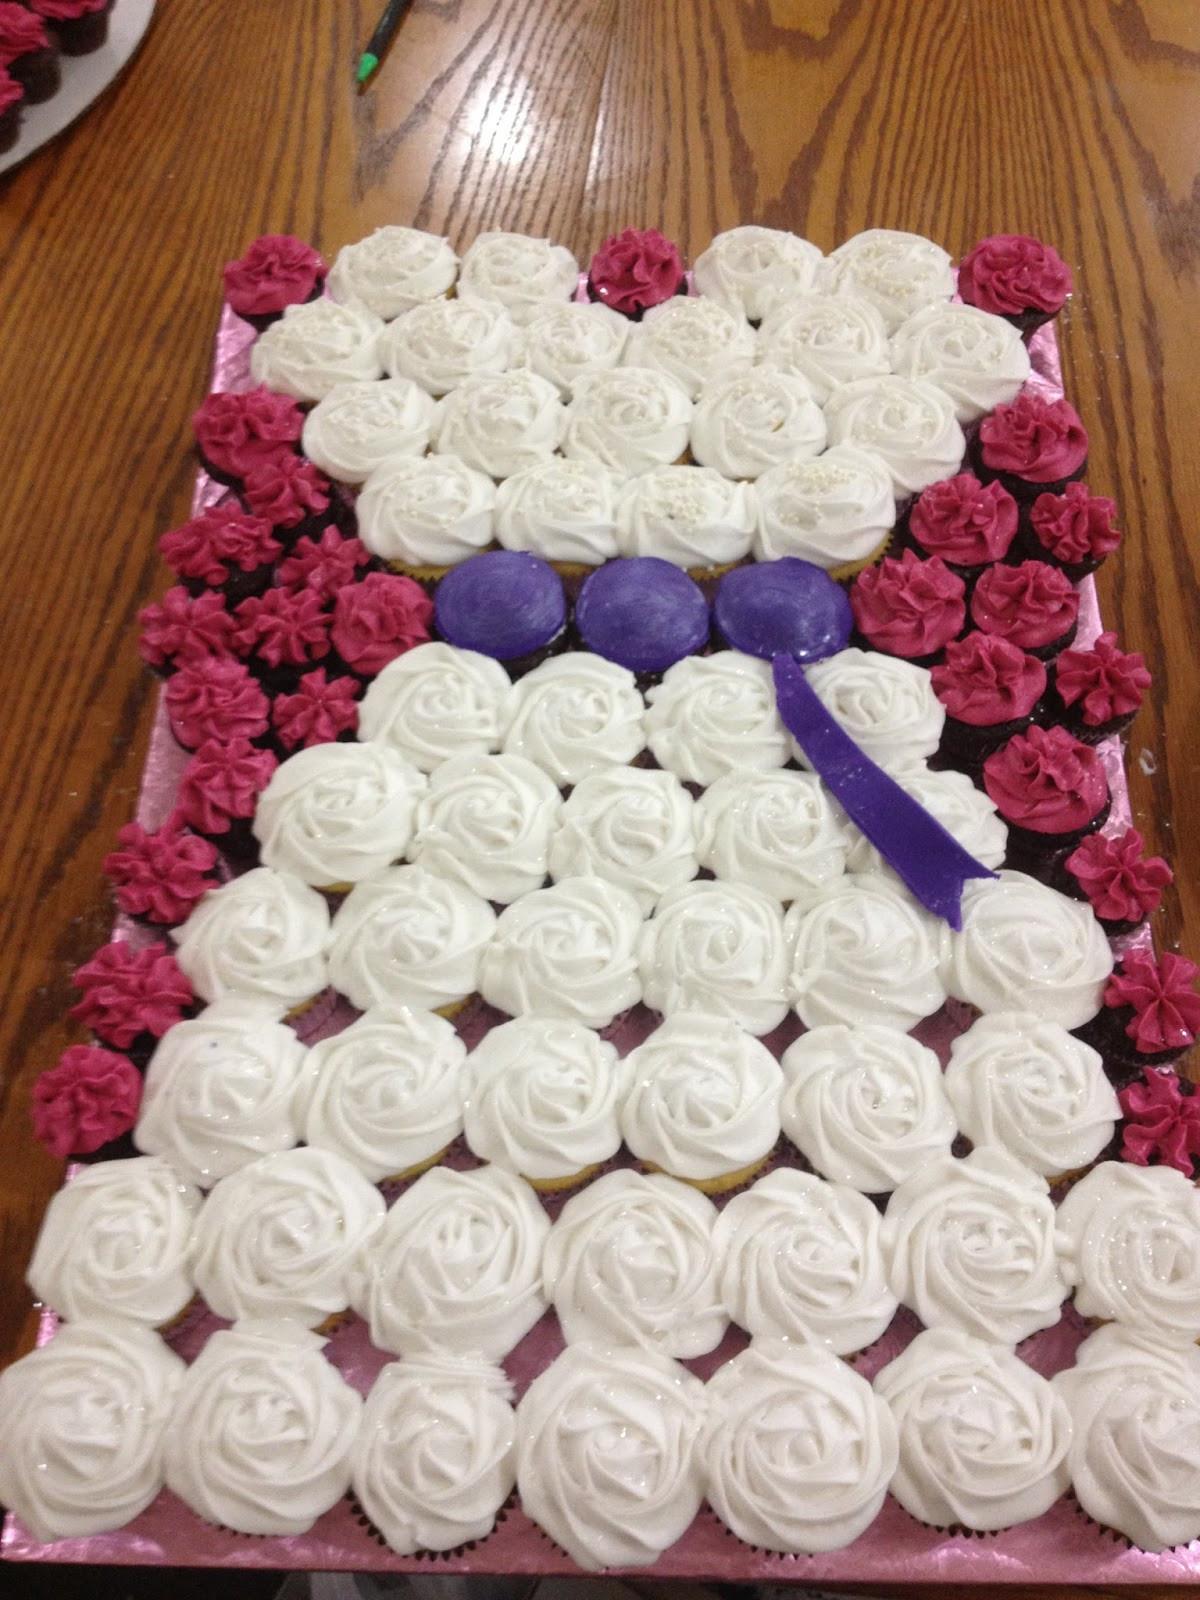 Bridal Shower Cupcakes  Life and Other Shenanigans Bridal Shower Cupcake Arrangement